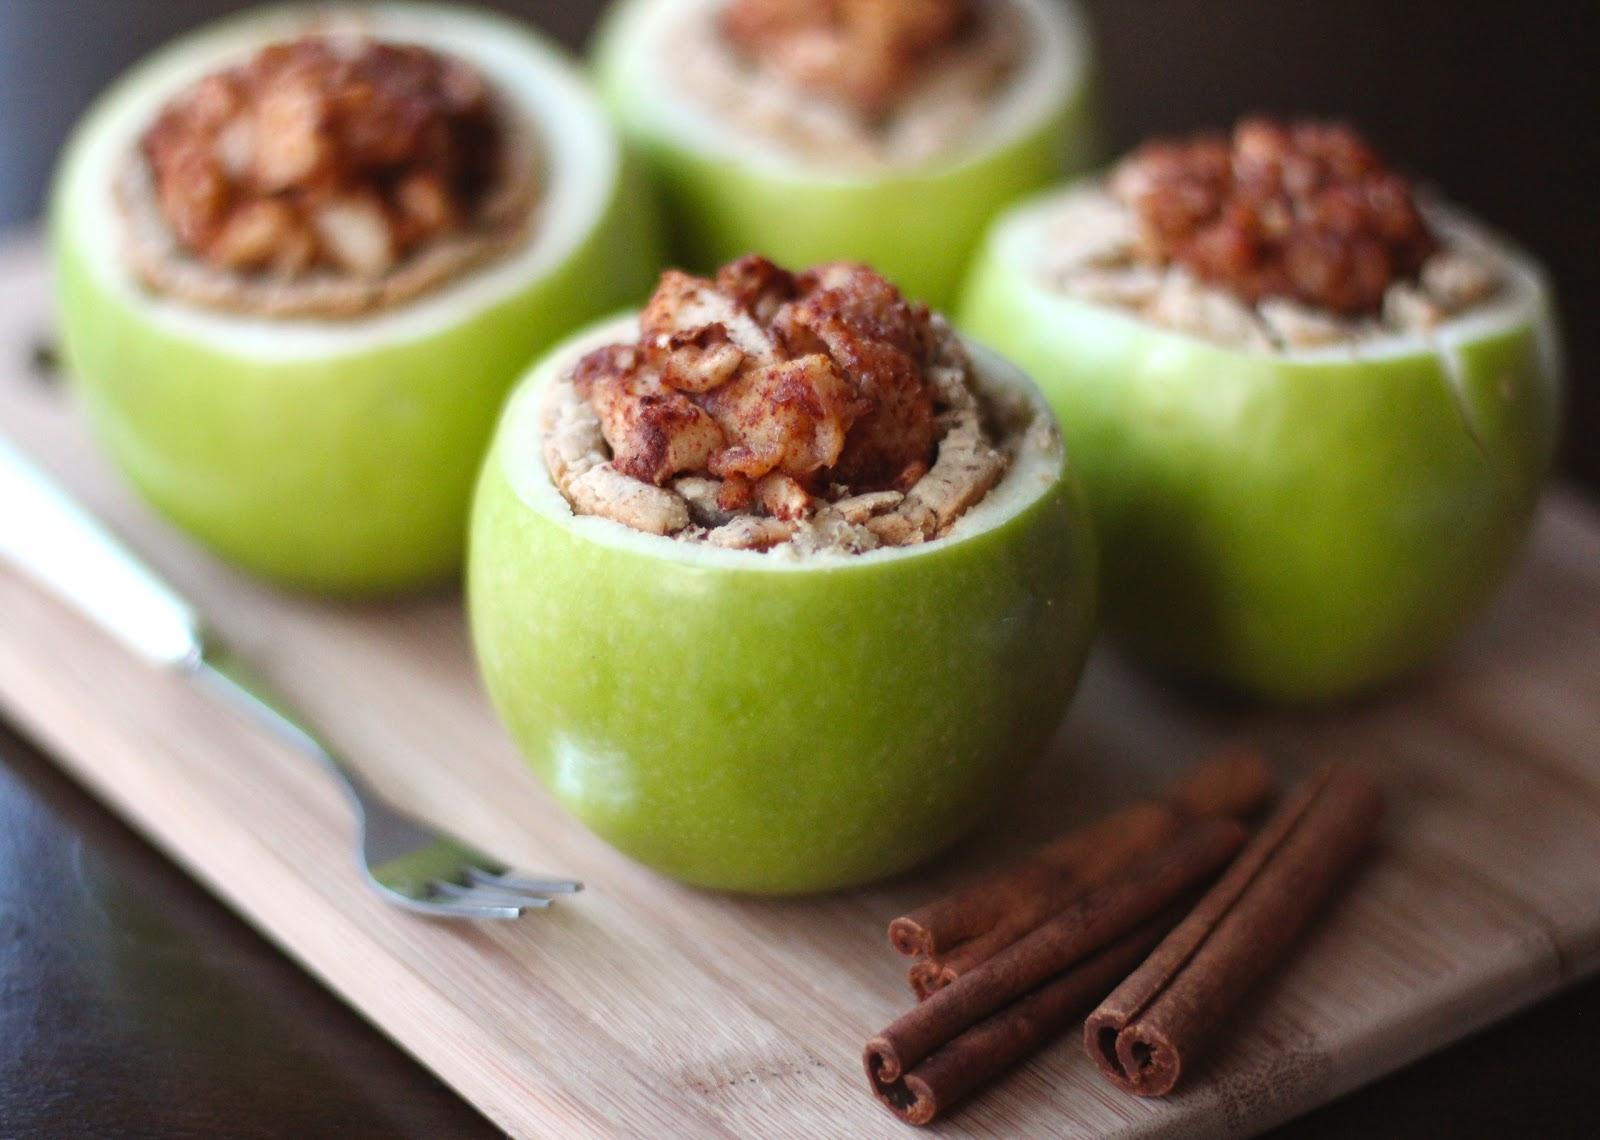 healthy fruit desserts recipes fruit pies